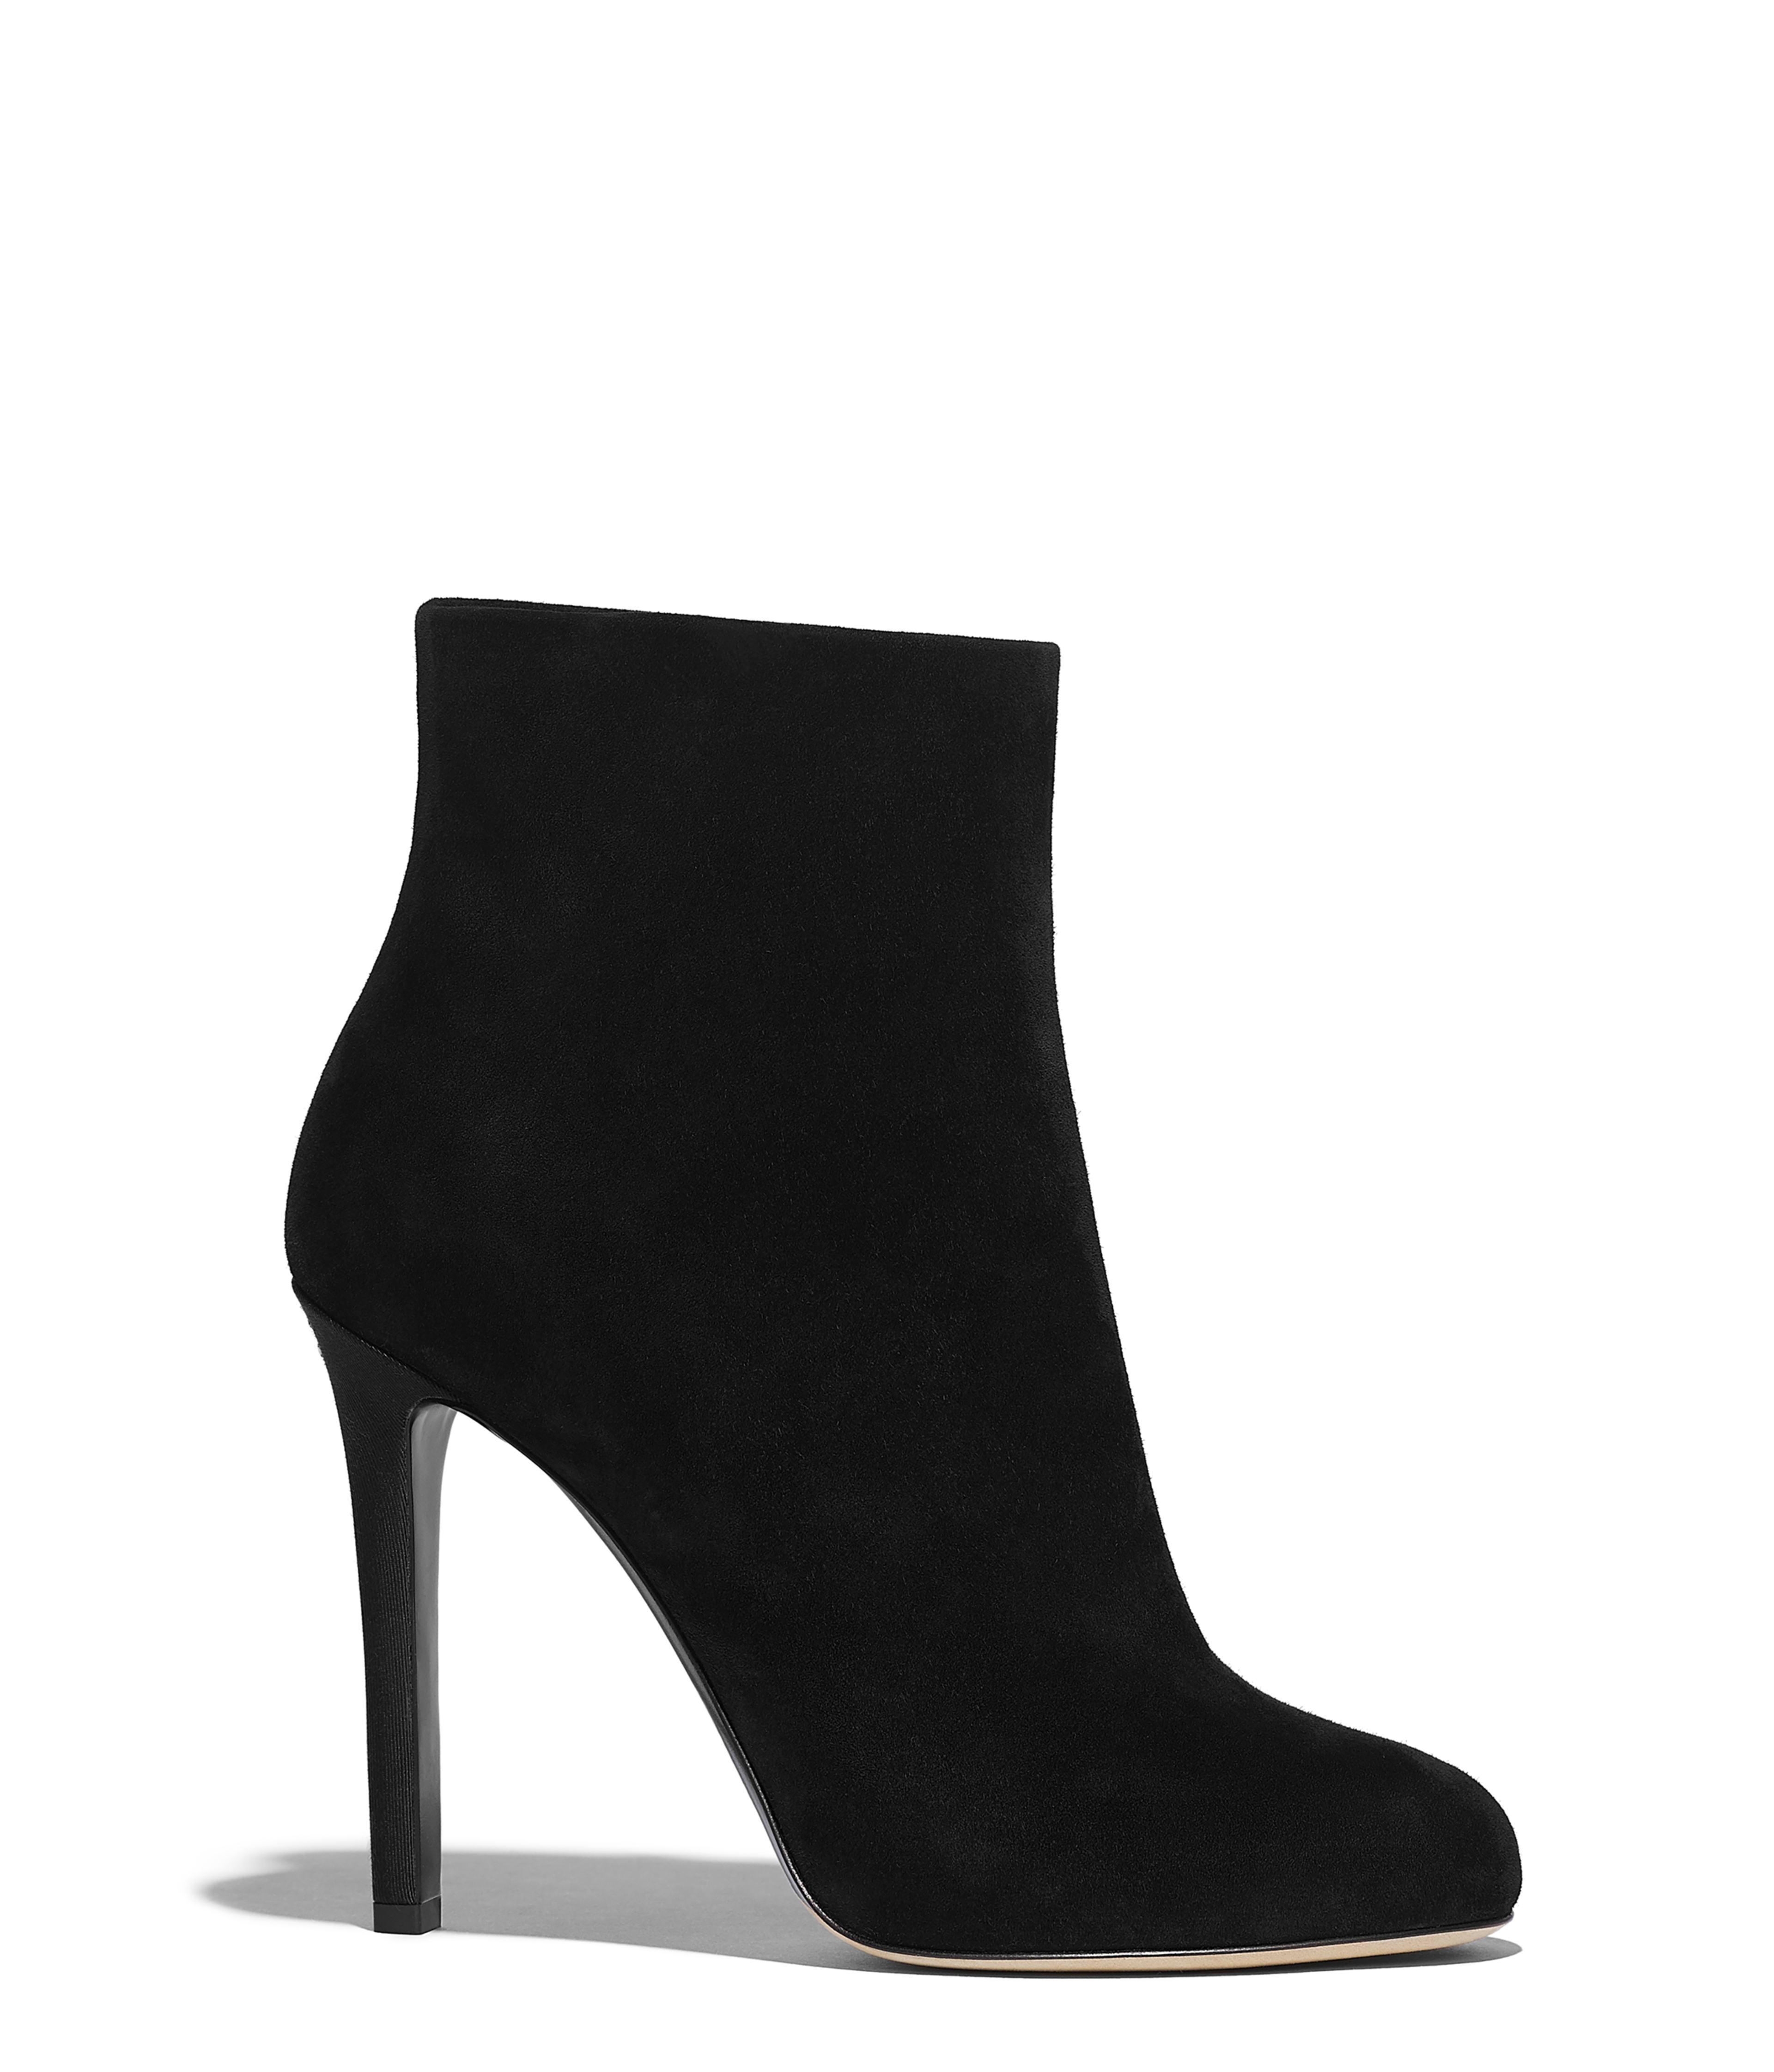 2f7934b0ab Short Boots Suede Calfskin, Black Ref. G35029X5138594305